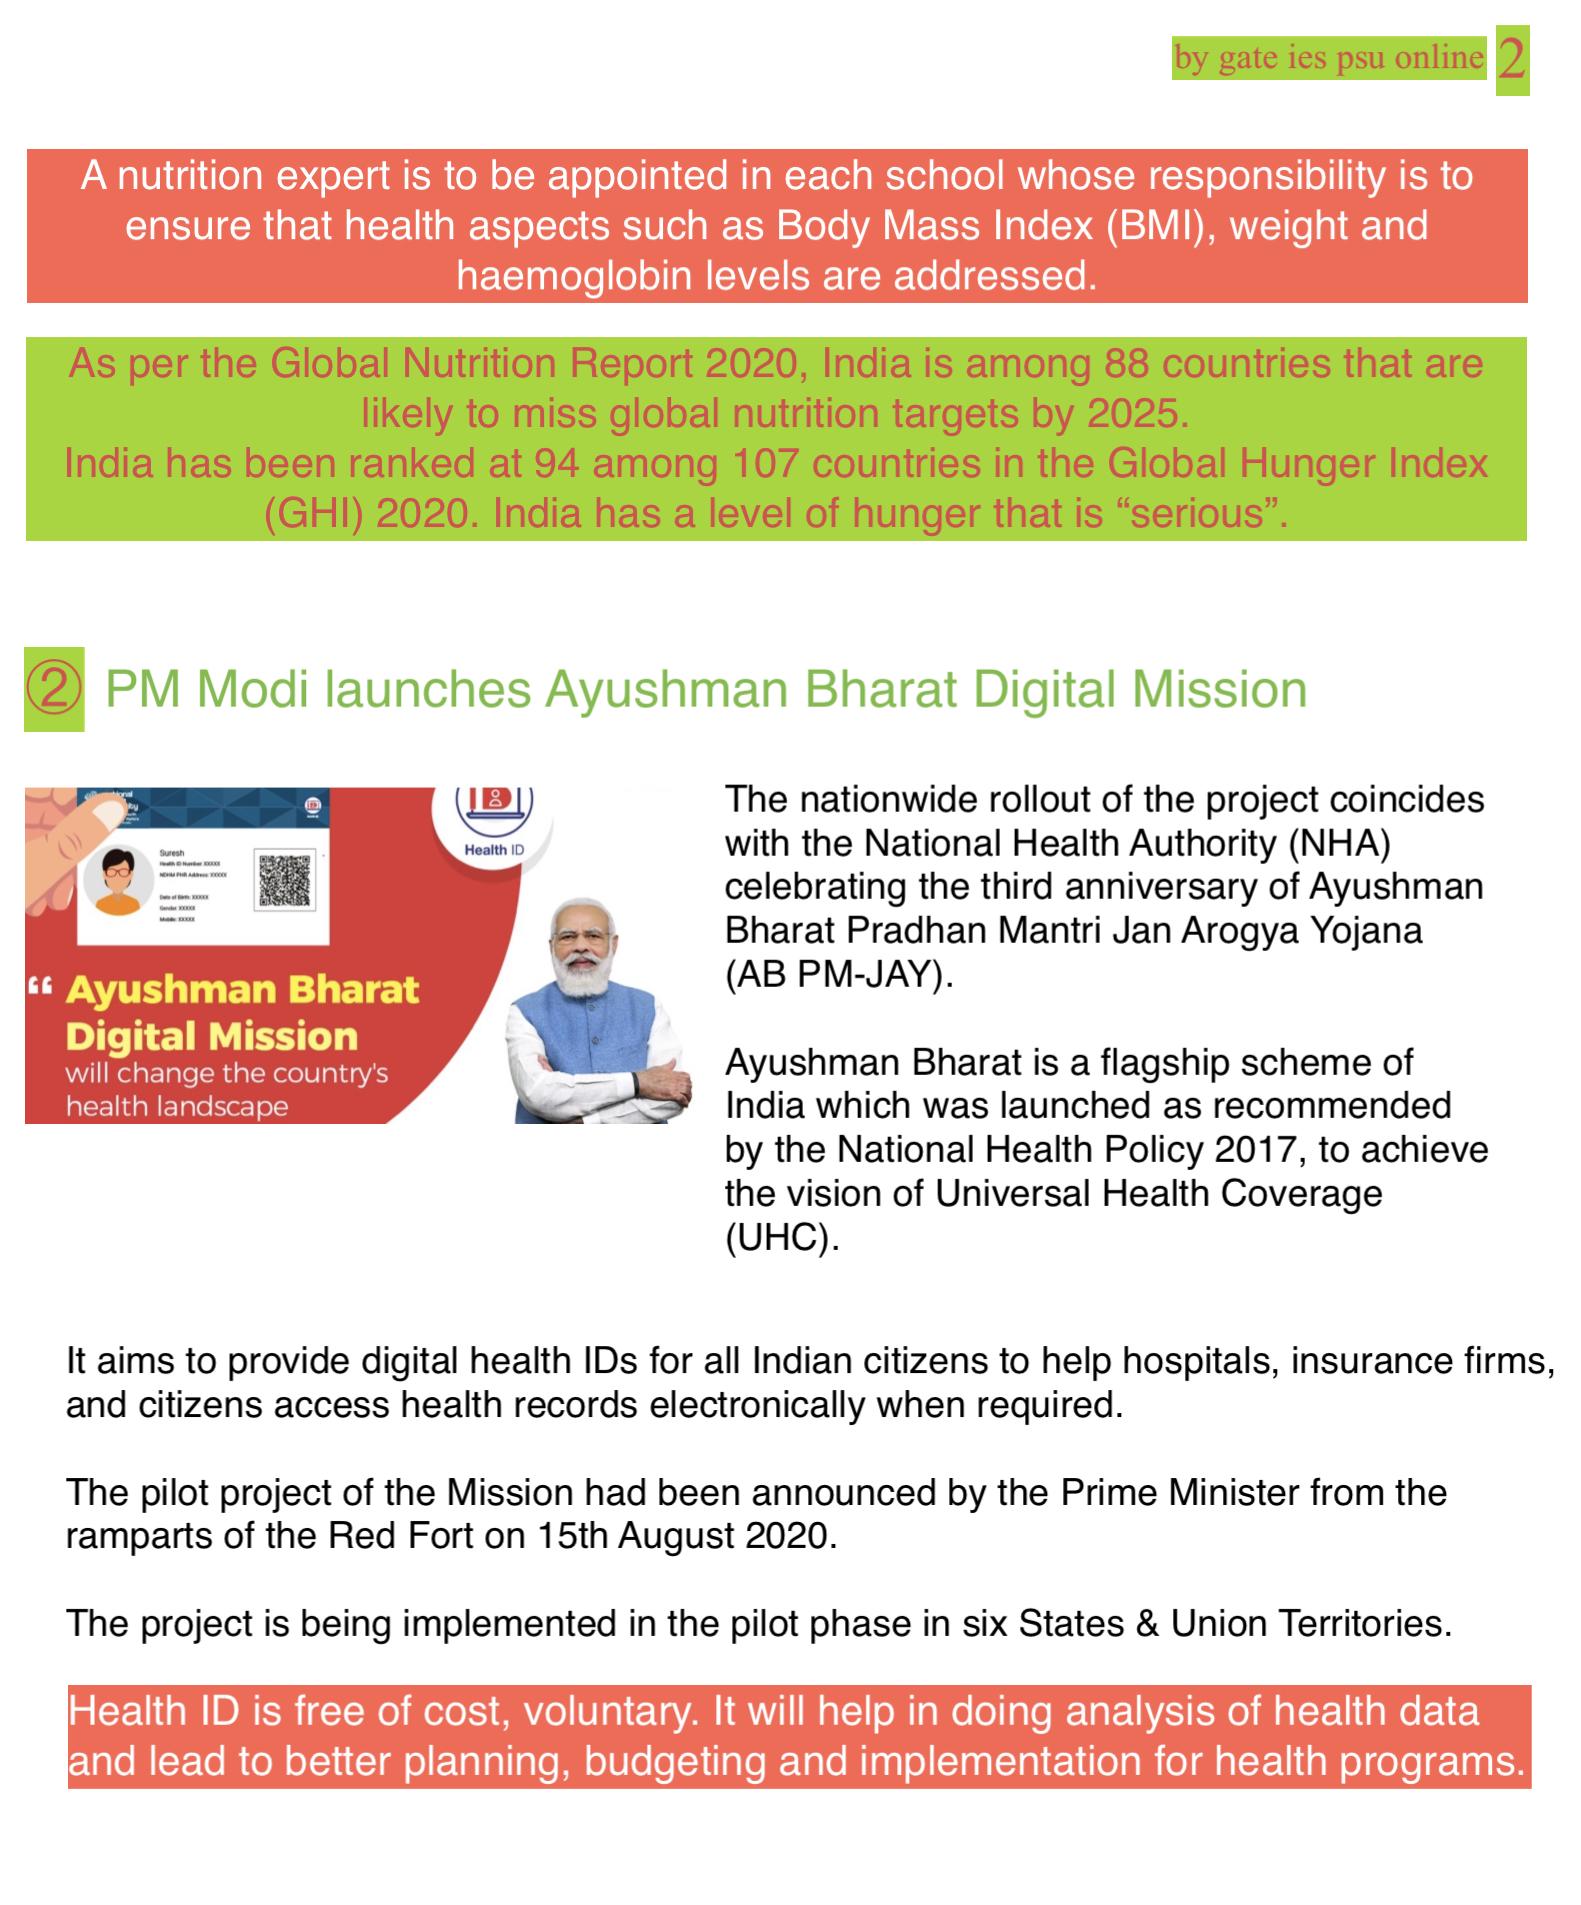 Ayushman Bharat digital mission current affairs upsc ies irms September 2021